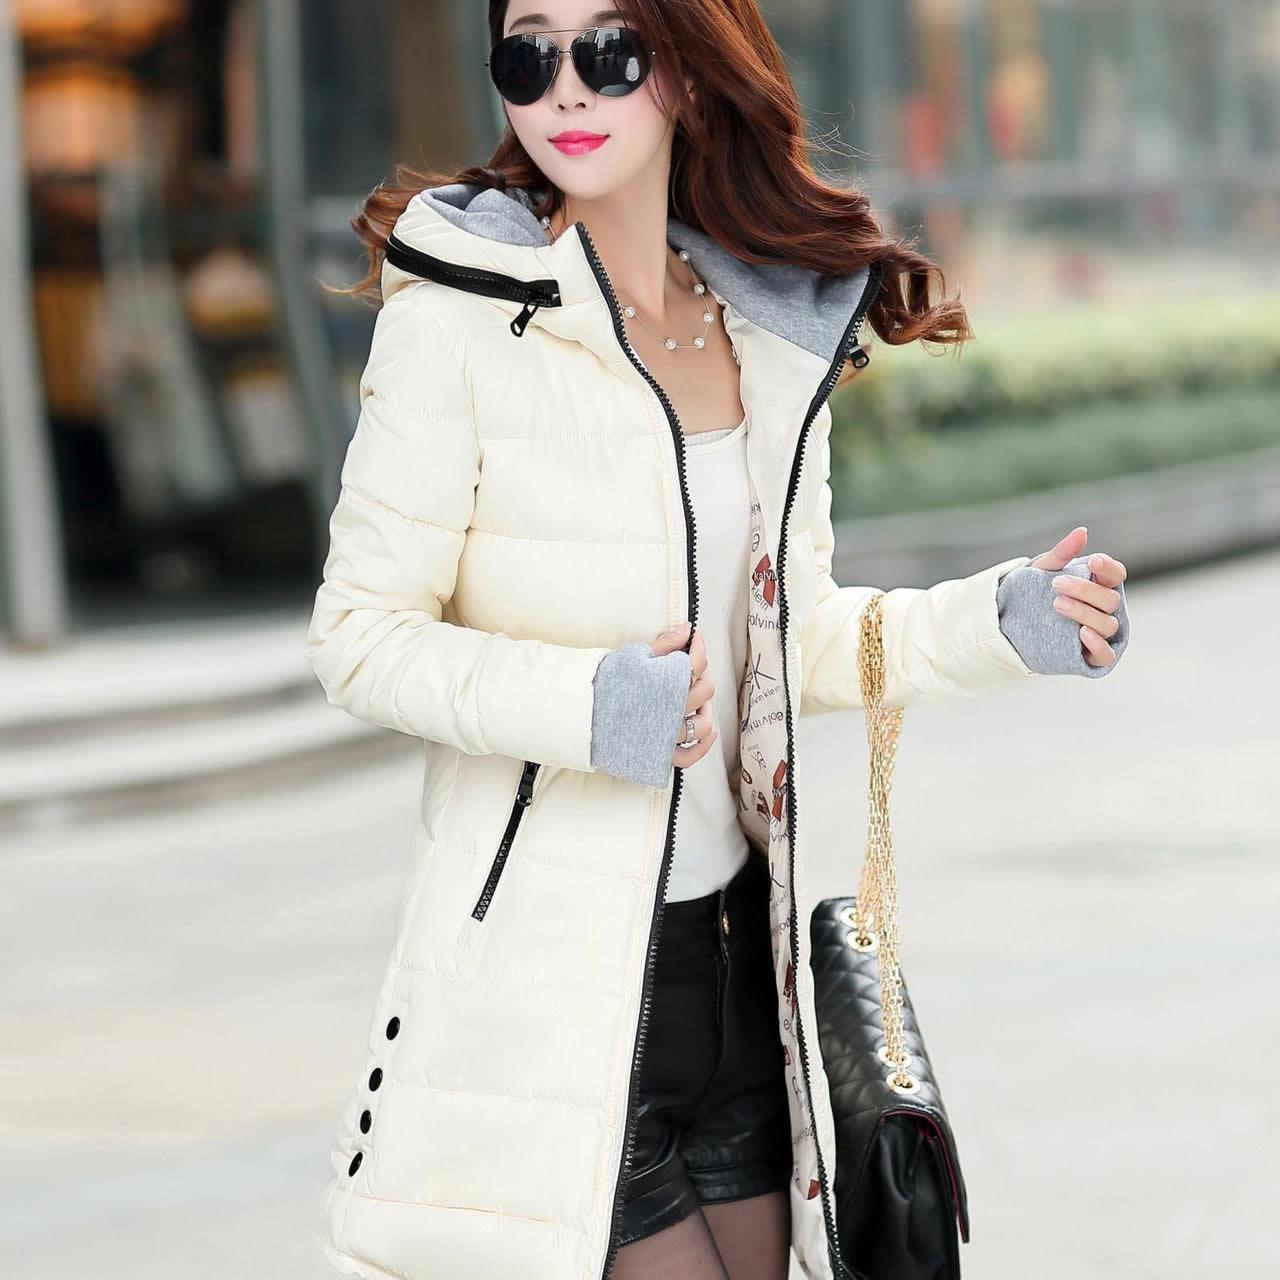 2018 Women Winter Hooded Warm Coat Slim Plus Size XXXL Basic Jacket Female Medium-Long Coats Jackets Jaqueta Feminina